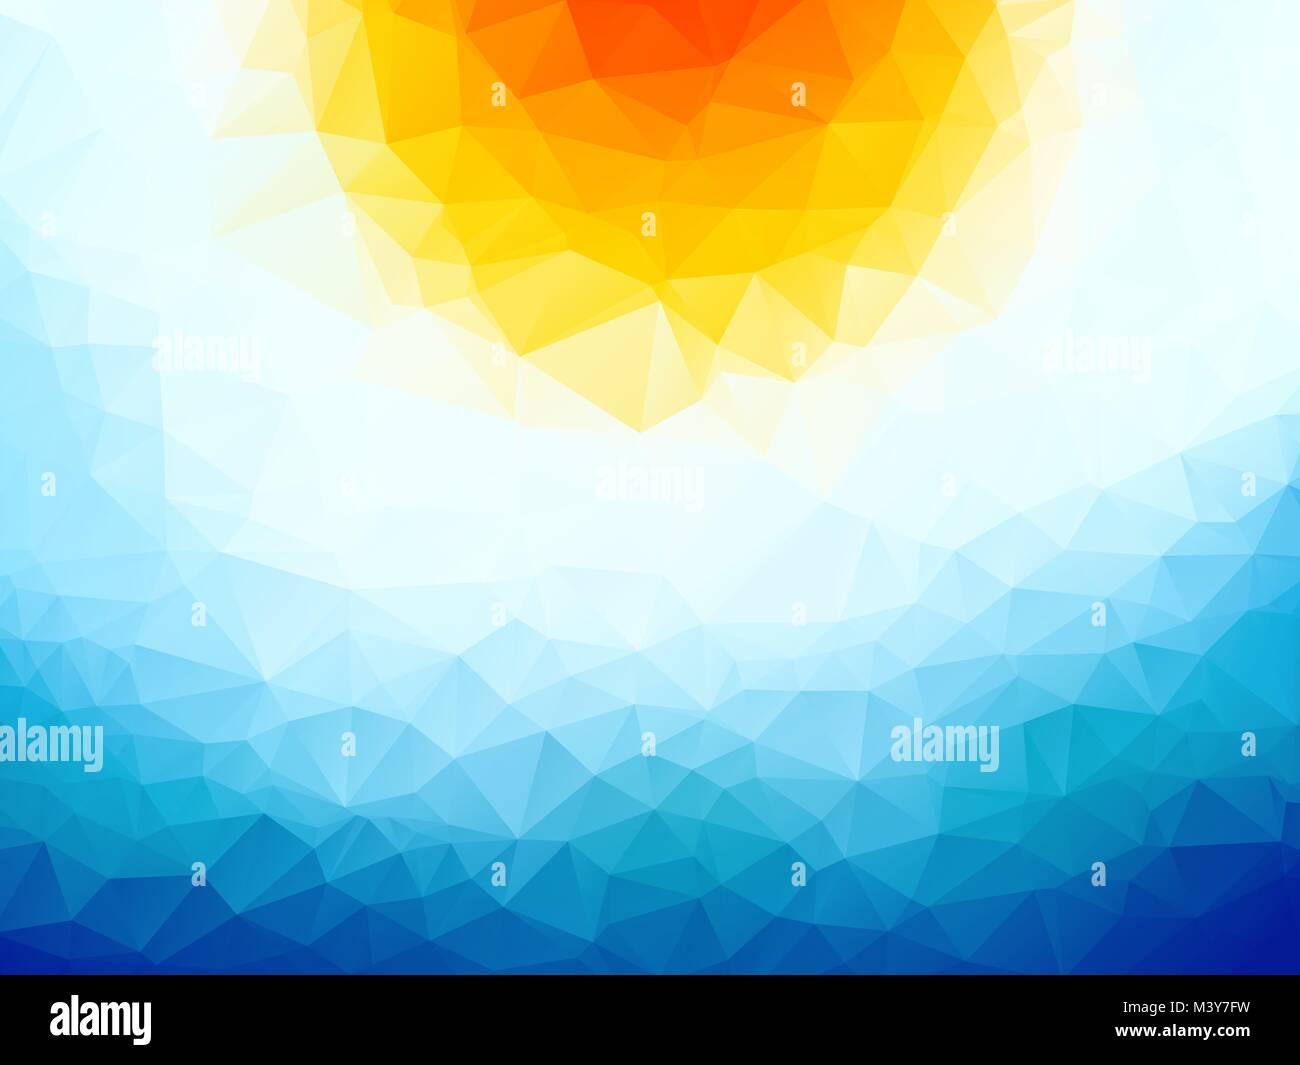 sun over the ocean triangular background - Stock Vector